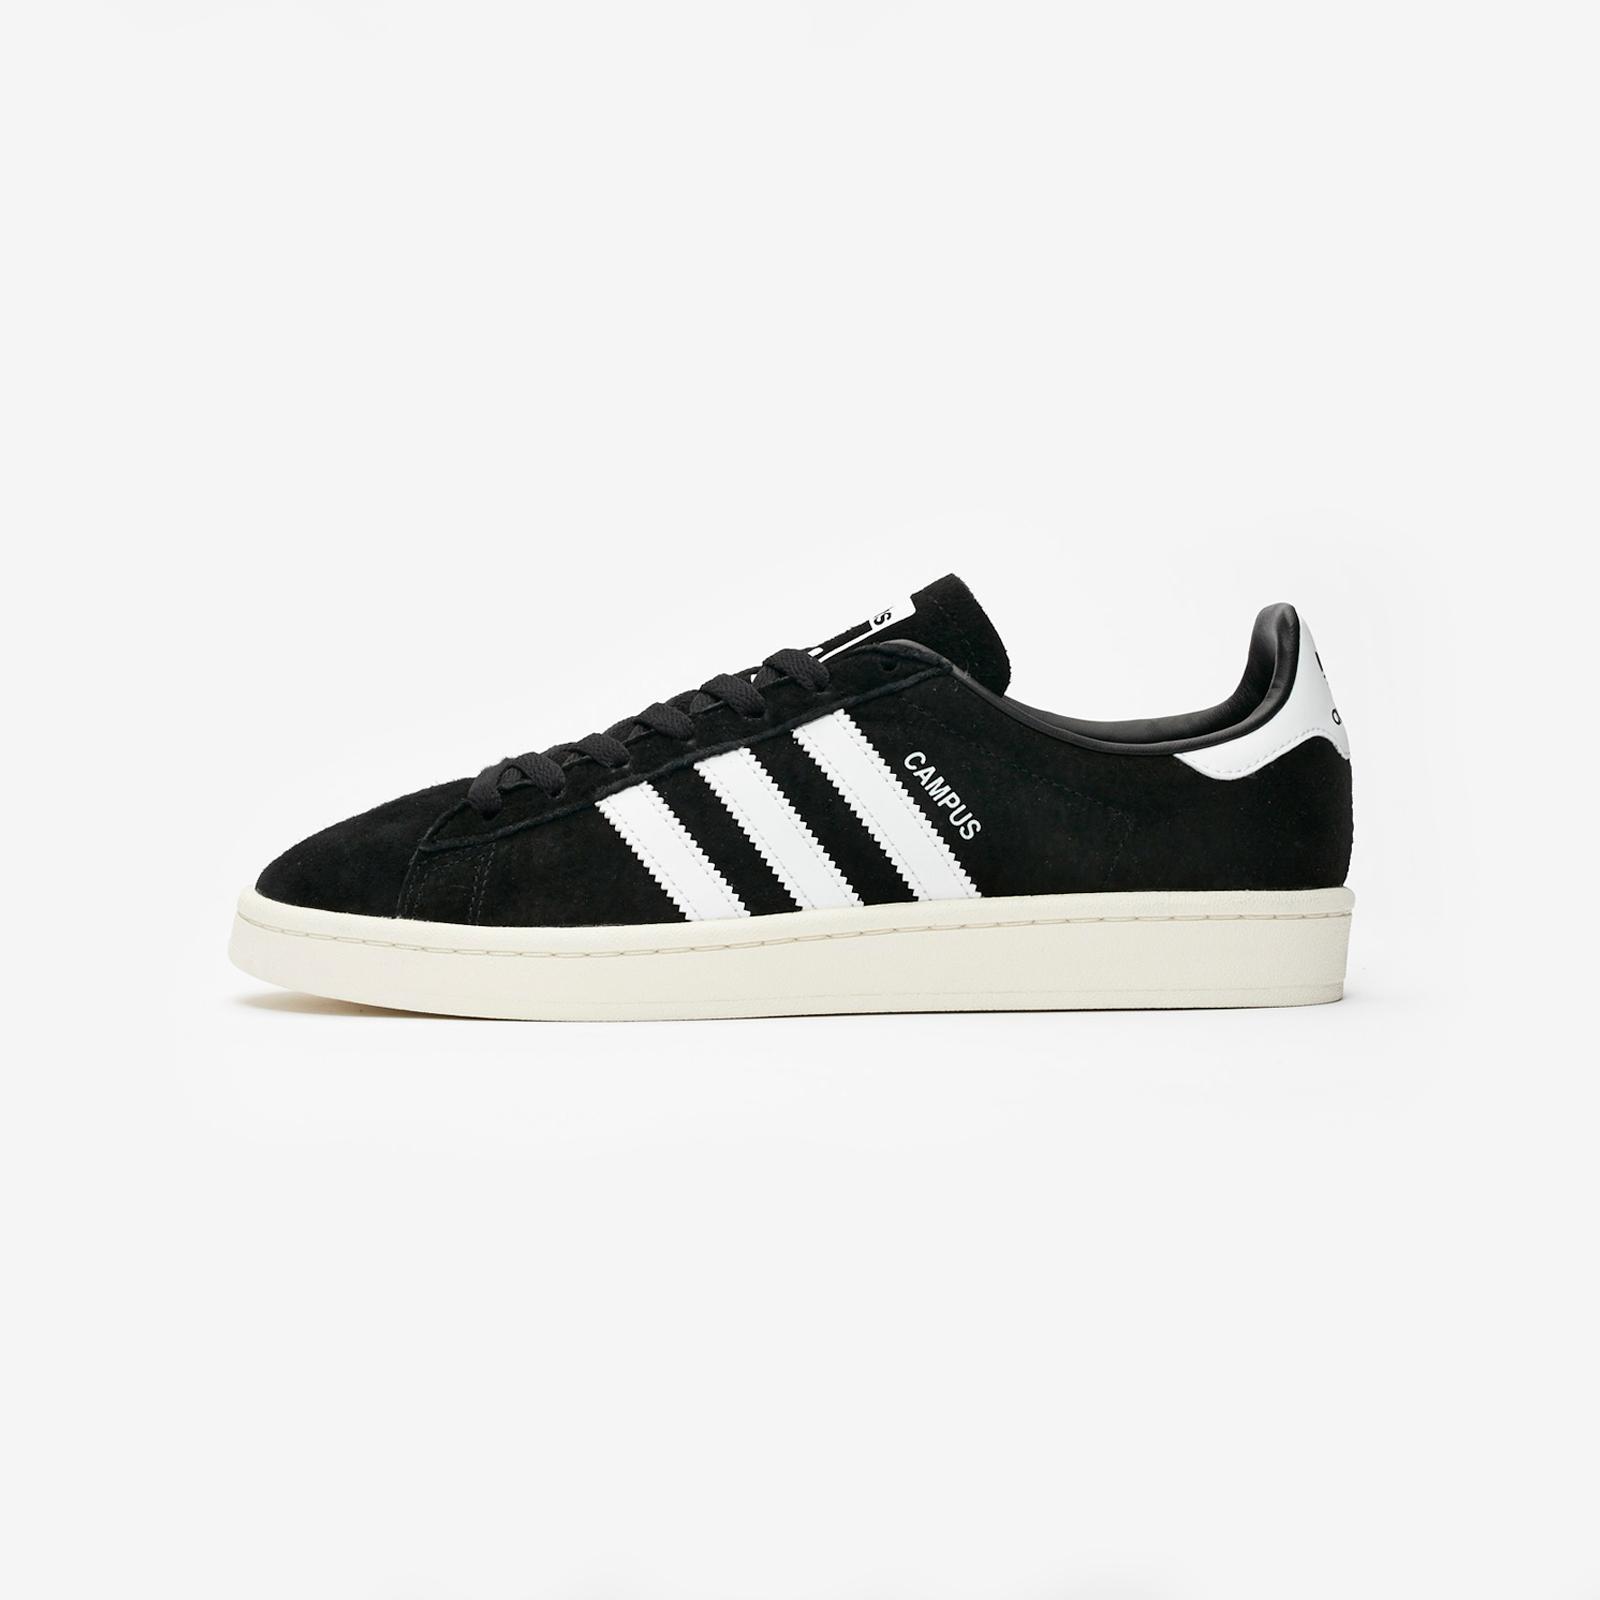 adidas campus all noir white stripes